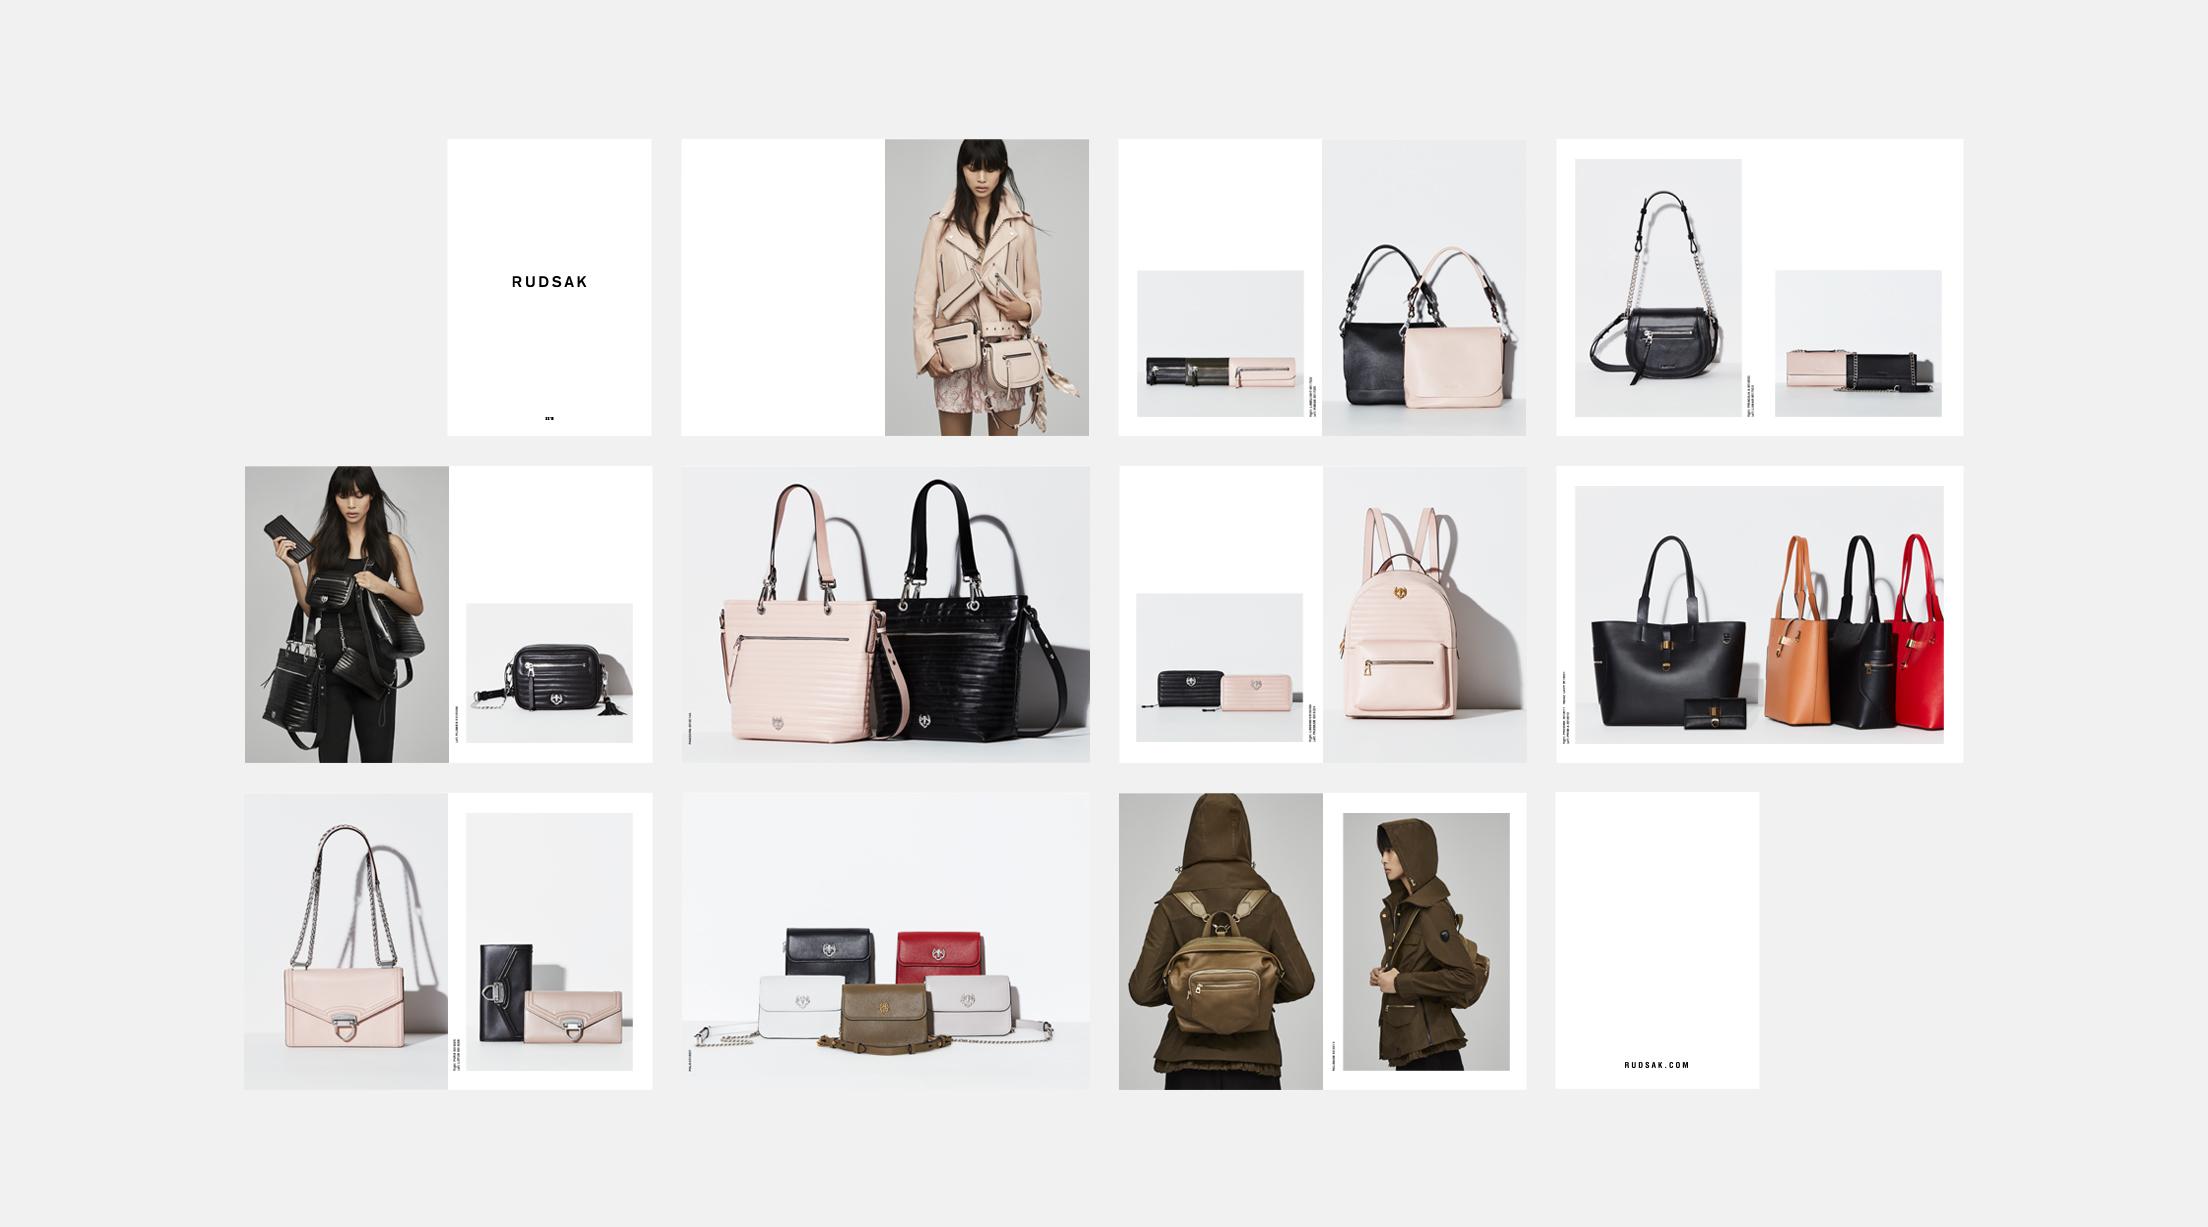 SS18 Lookbook - Handbags, Backpacks